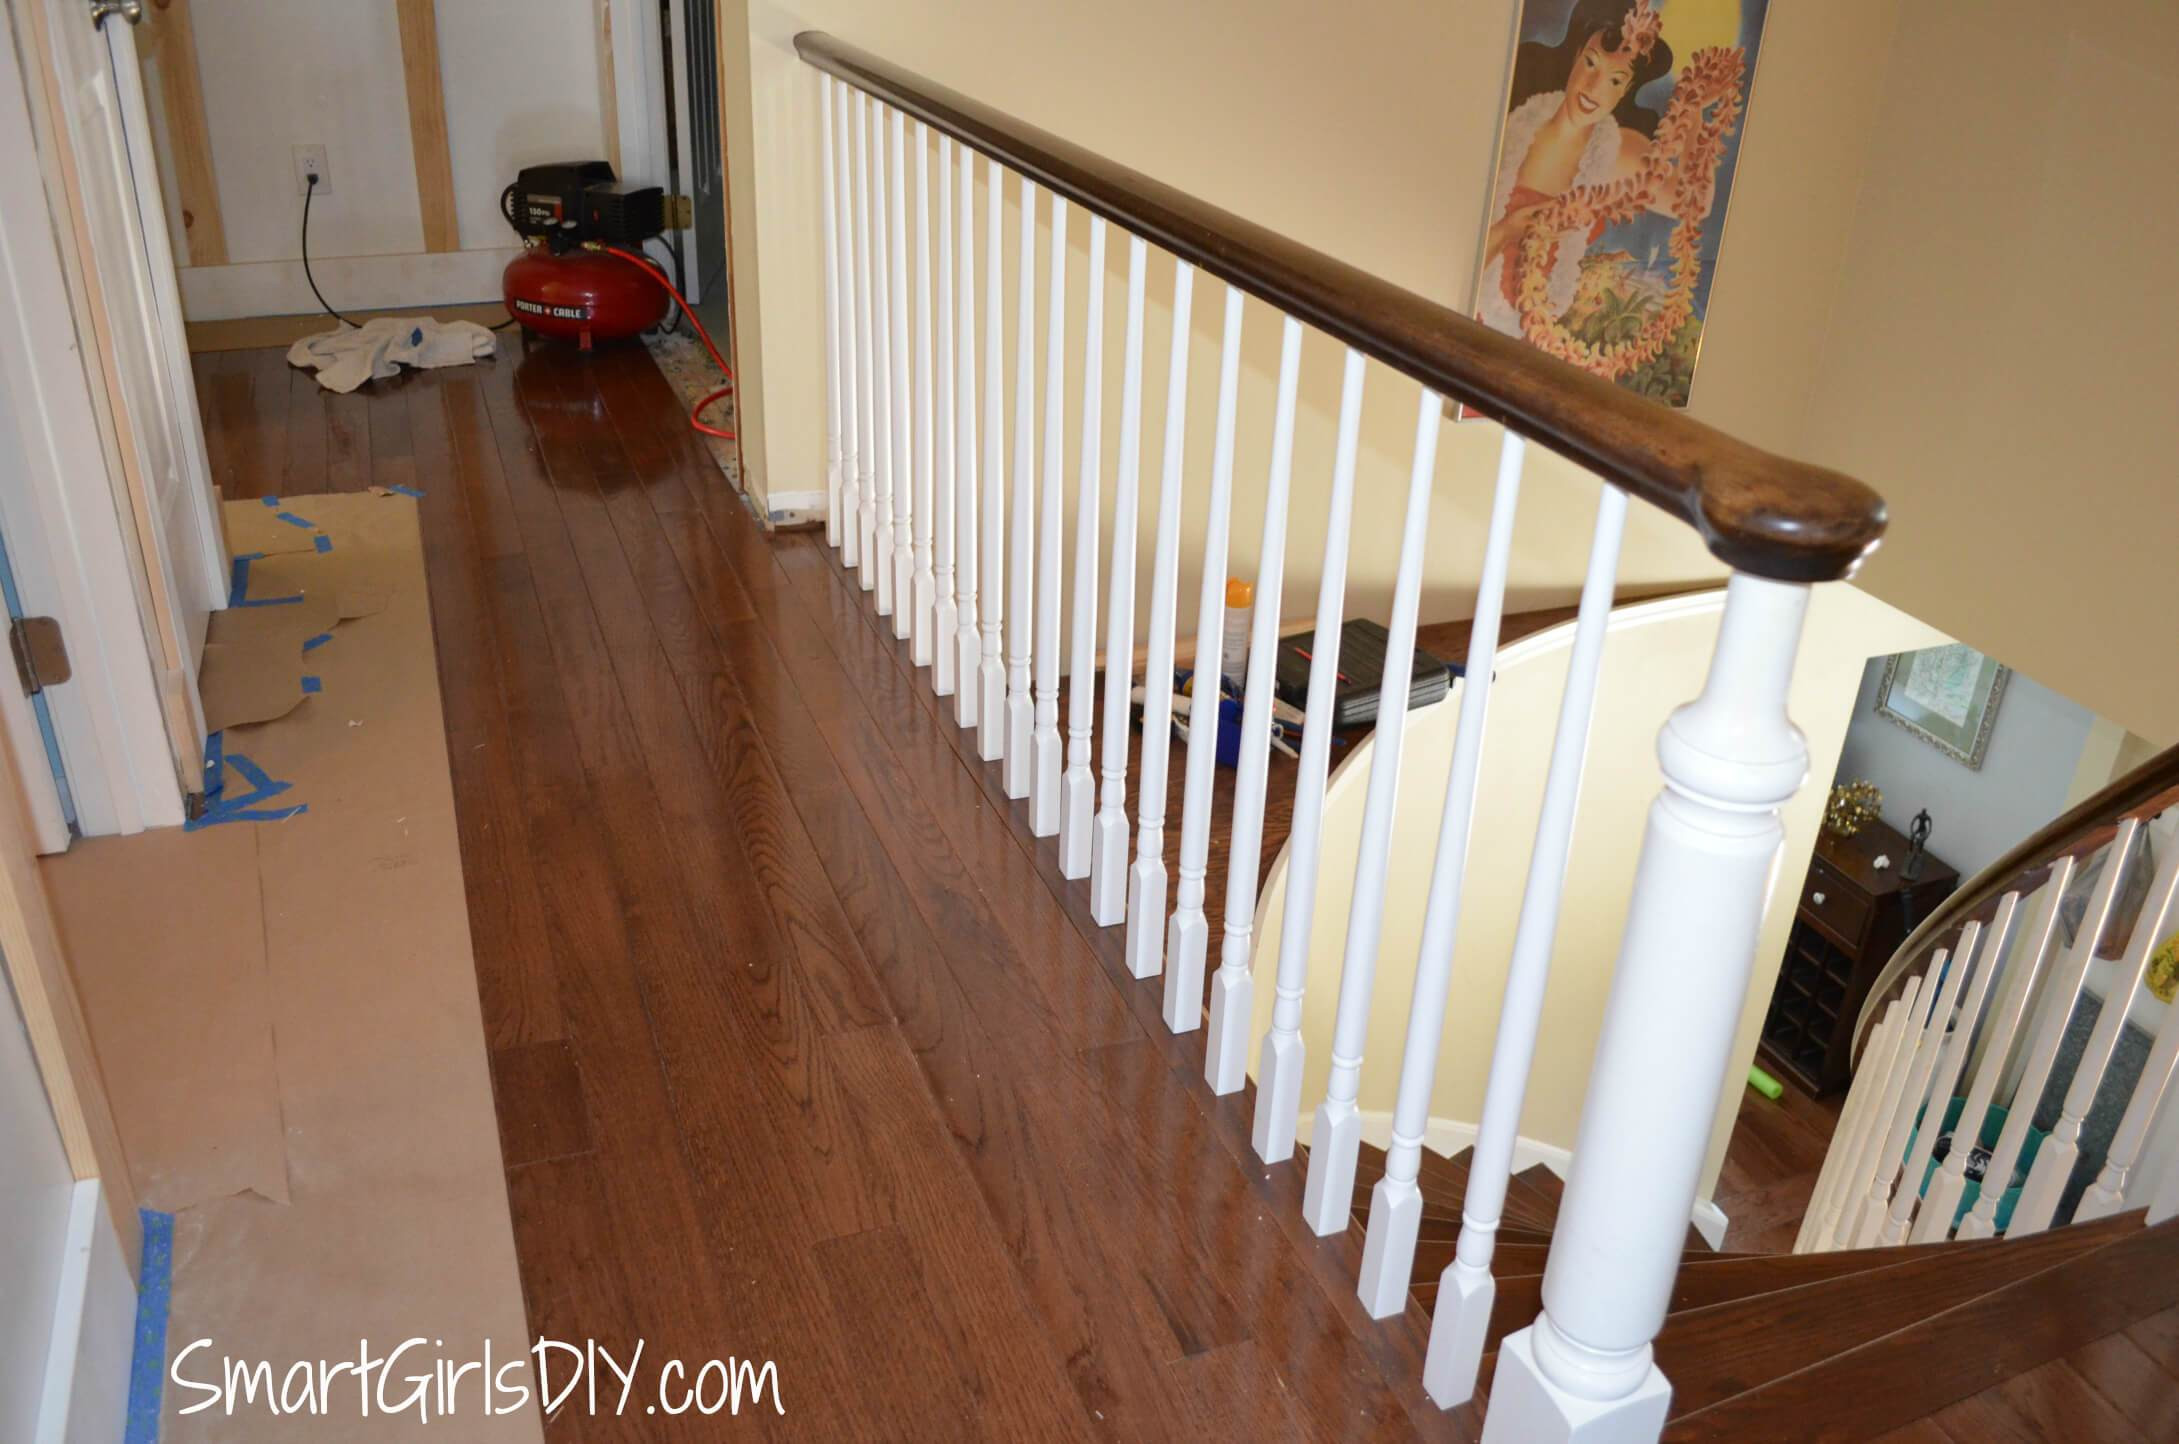 Felt Paper for Hardwood Flooring Of Upstairs Hallway 1 Installing Hardwood Floors within Upstairs Hallway 2 Hardwood Spindles